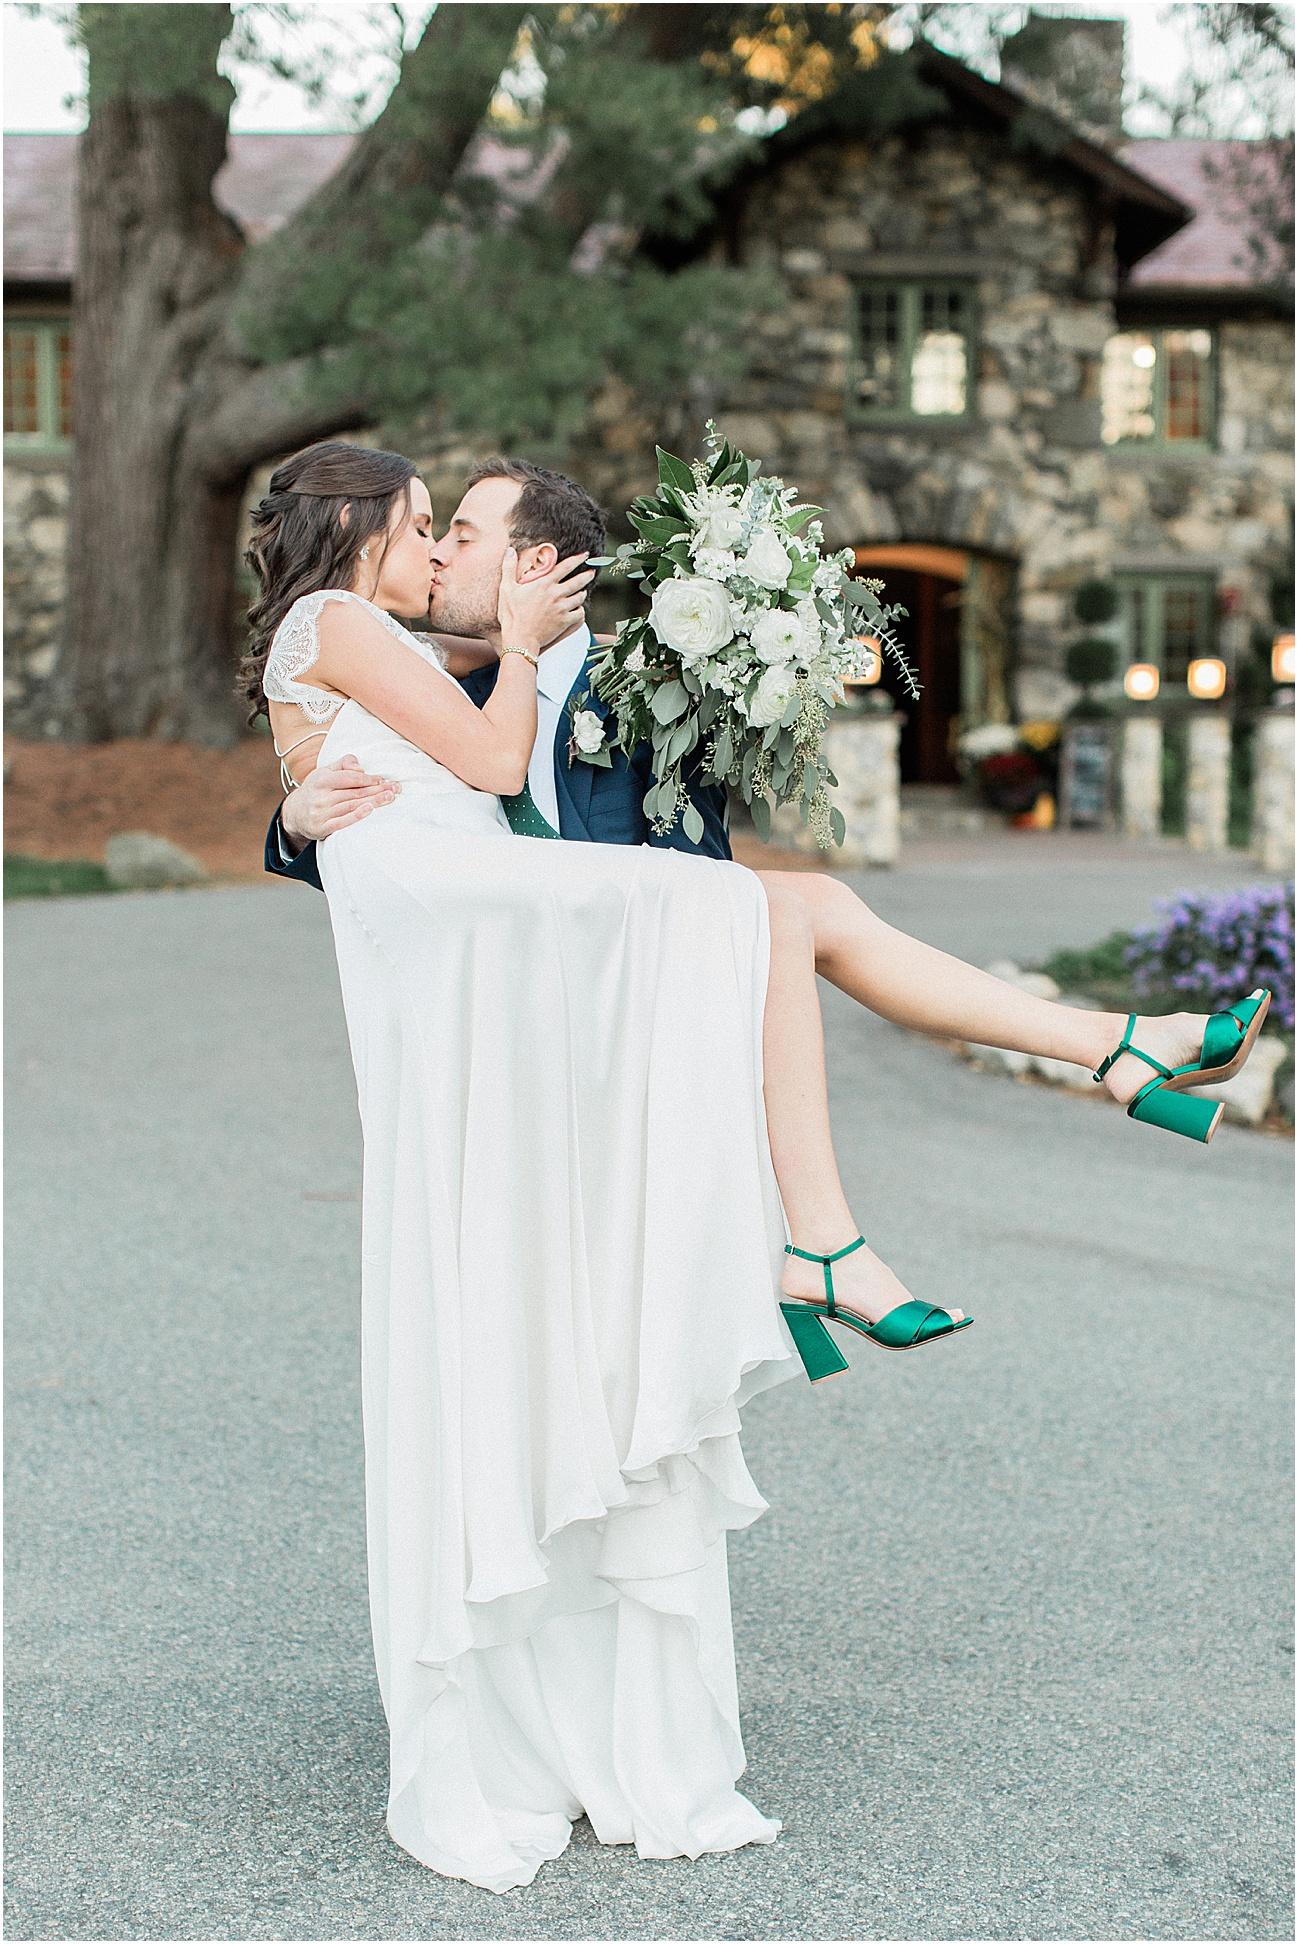 jenna_mike_willowdale_estate_topsfield_neutral_whites_greens_fall_cape_cod_boston_wedding_photographer_meredith_jane_photography_photo_1458.jpg